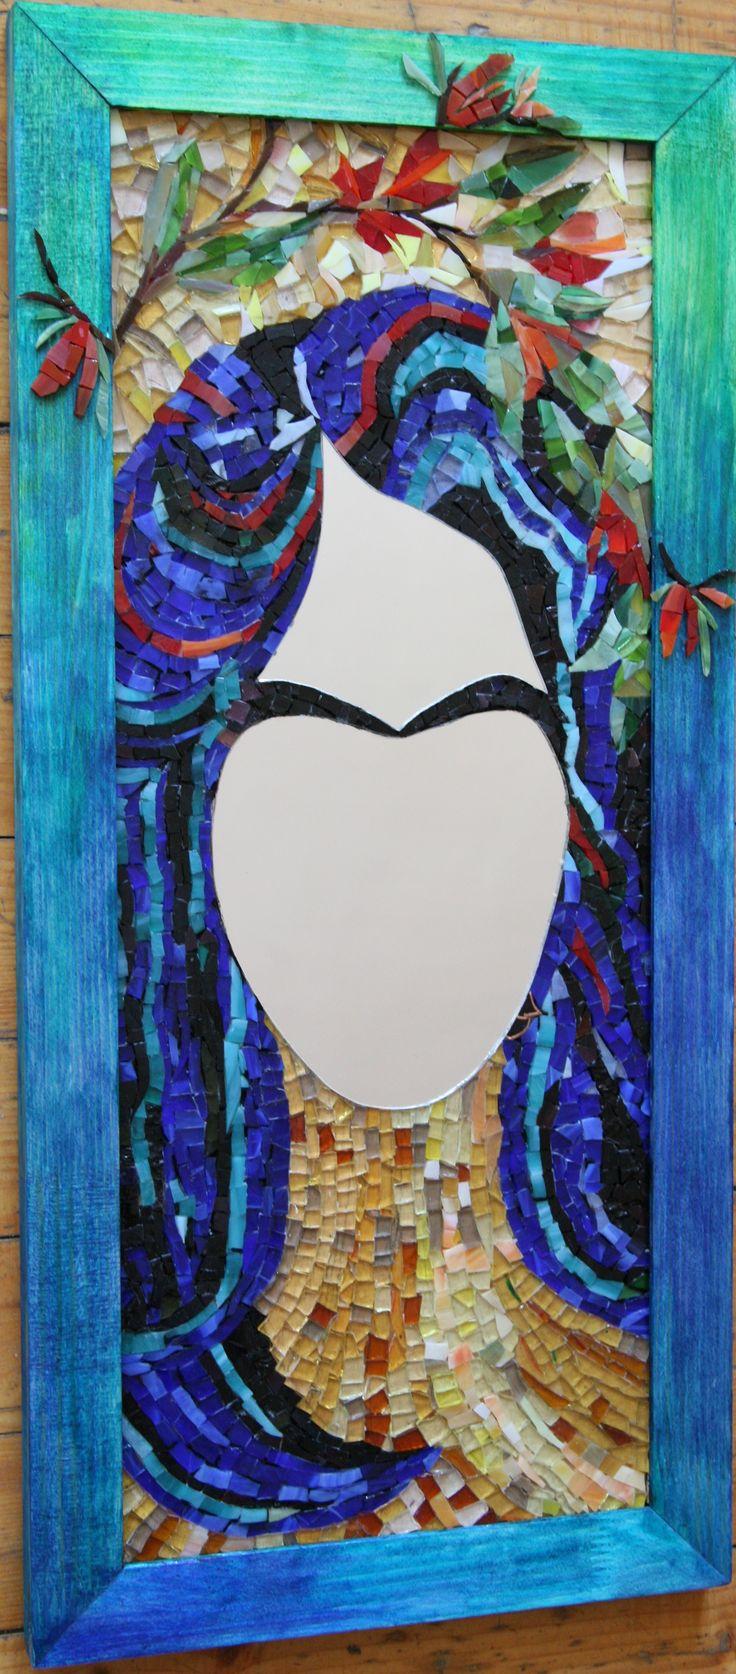 Mozaic de sticla/oglinda (pe placaj de lemn)